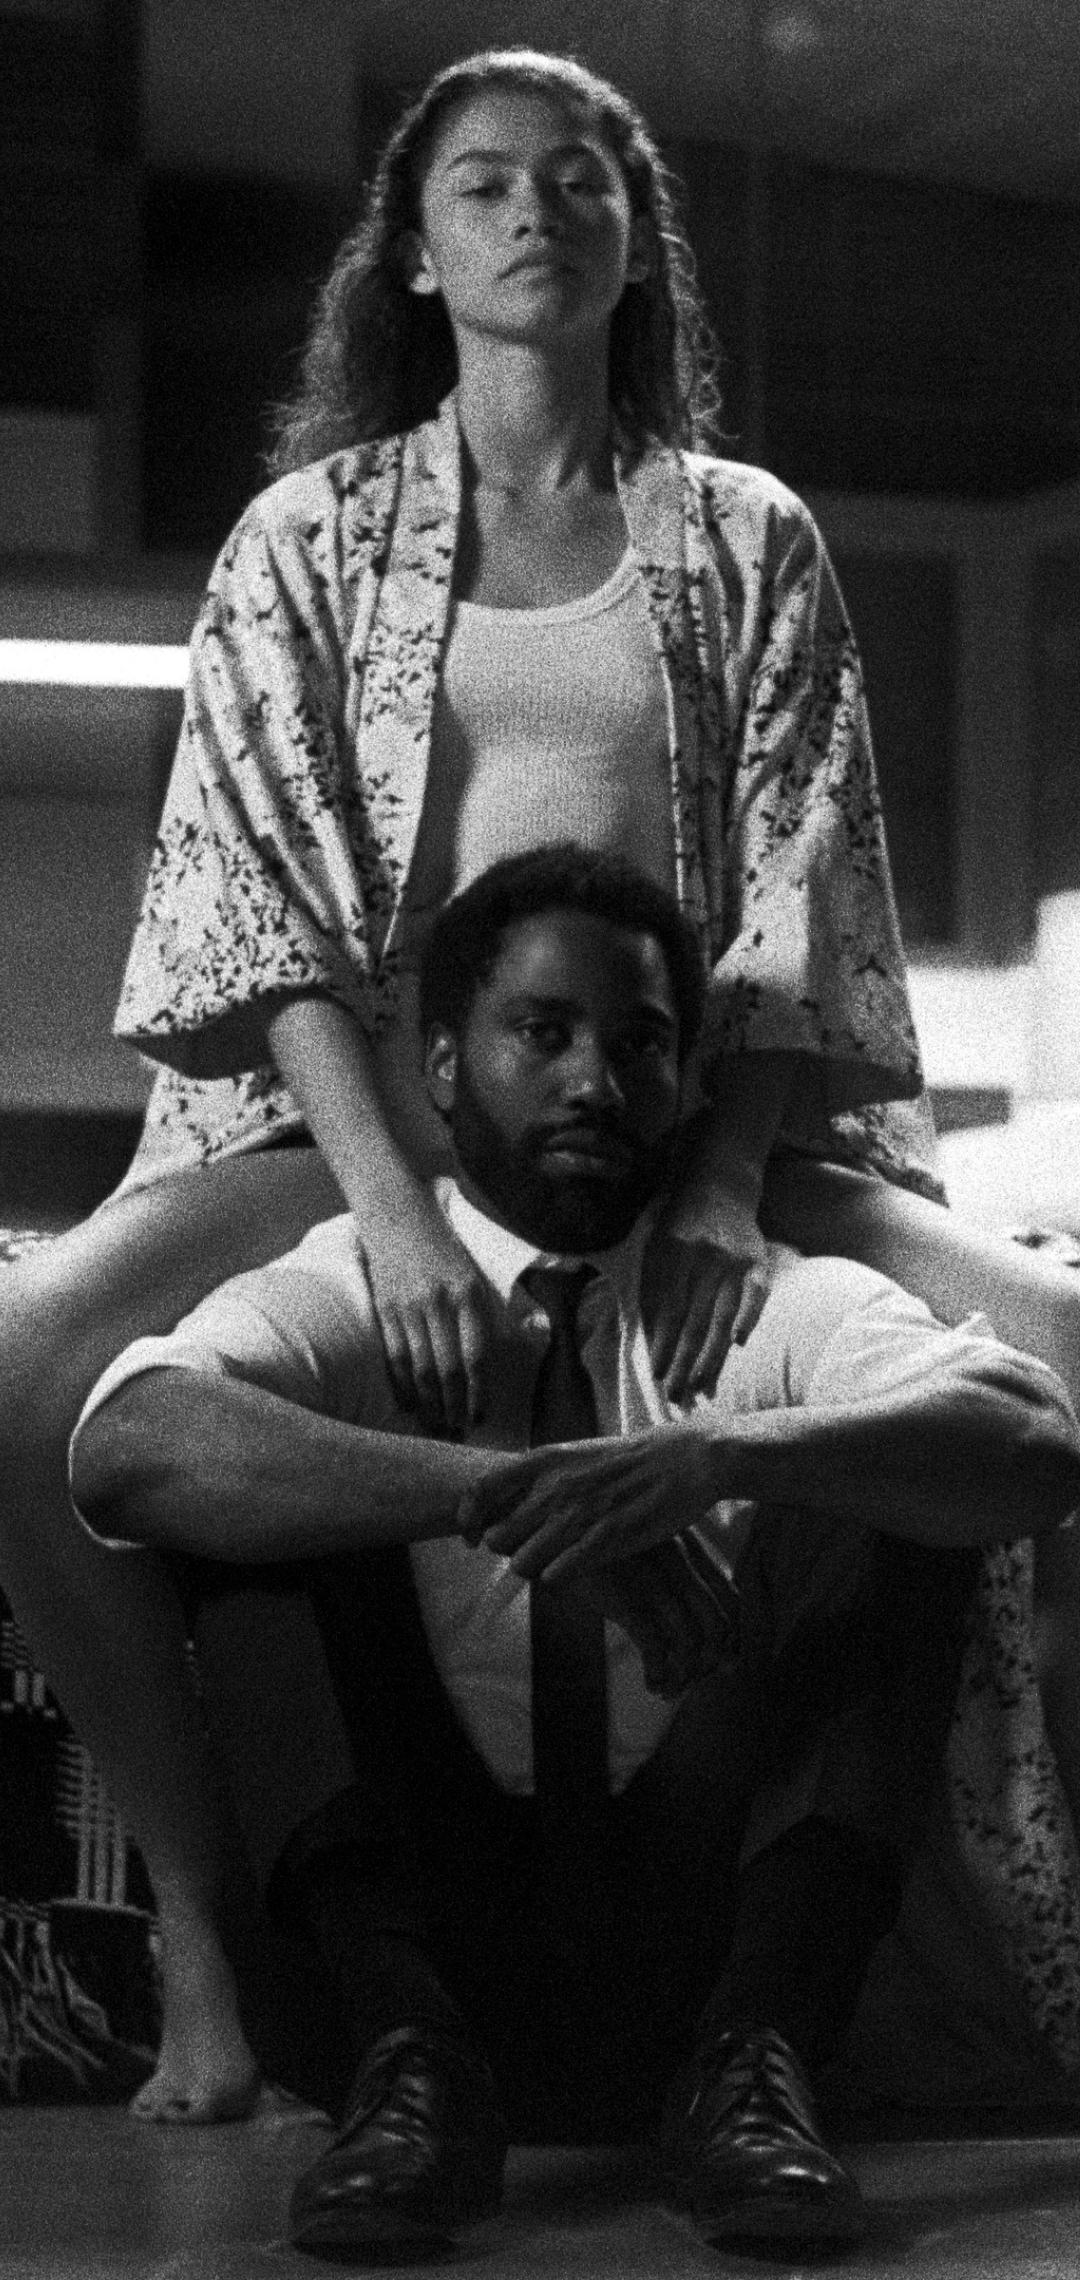 Zendaya & John Washington from Malcolm & Marie Wallpaper in 1080x2280 Resolution